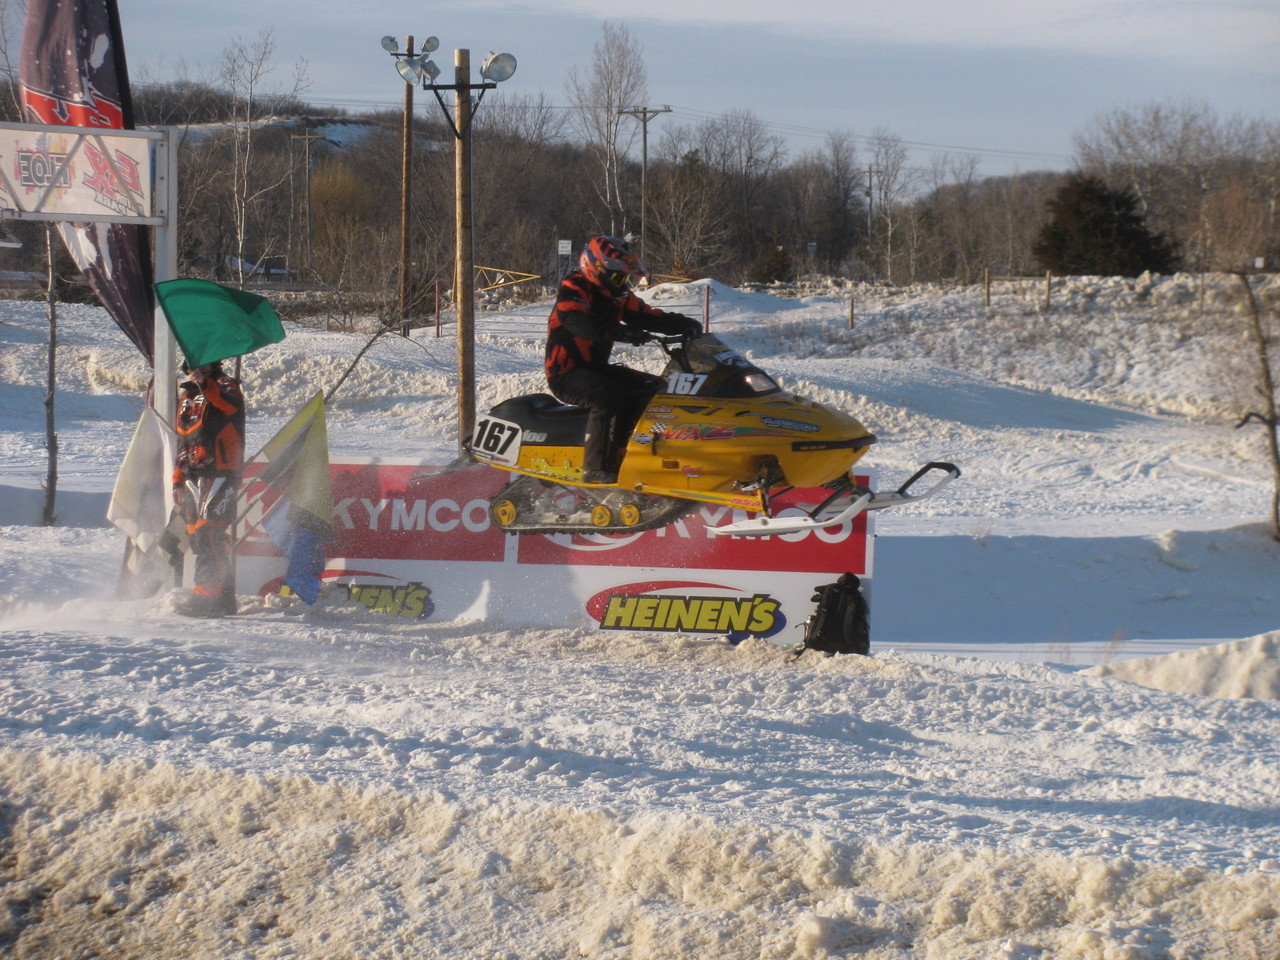 Sam Lungstrom in level flight on the Plasti-Sleeve sponsored #167 Ski-Doo.